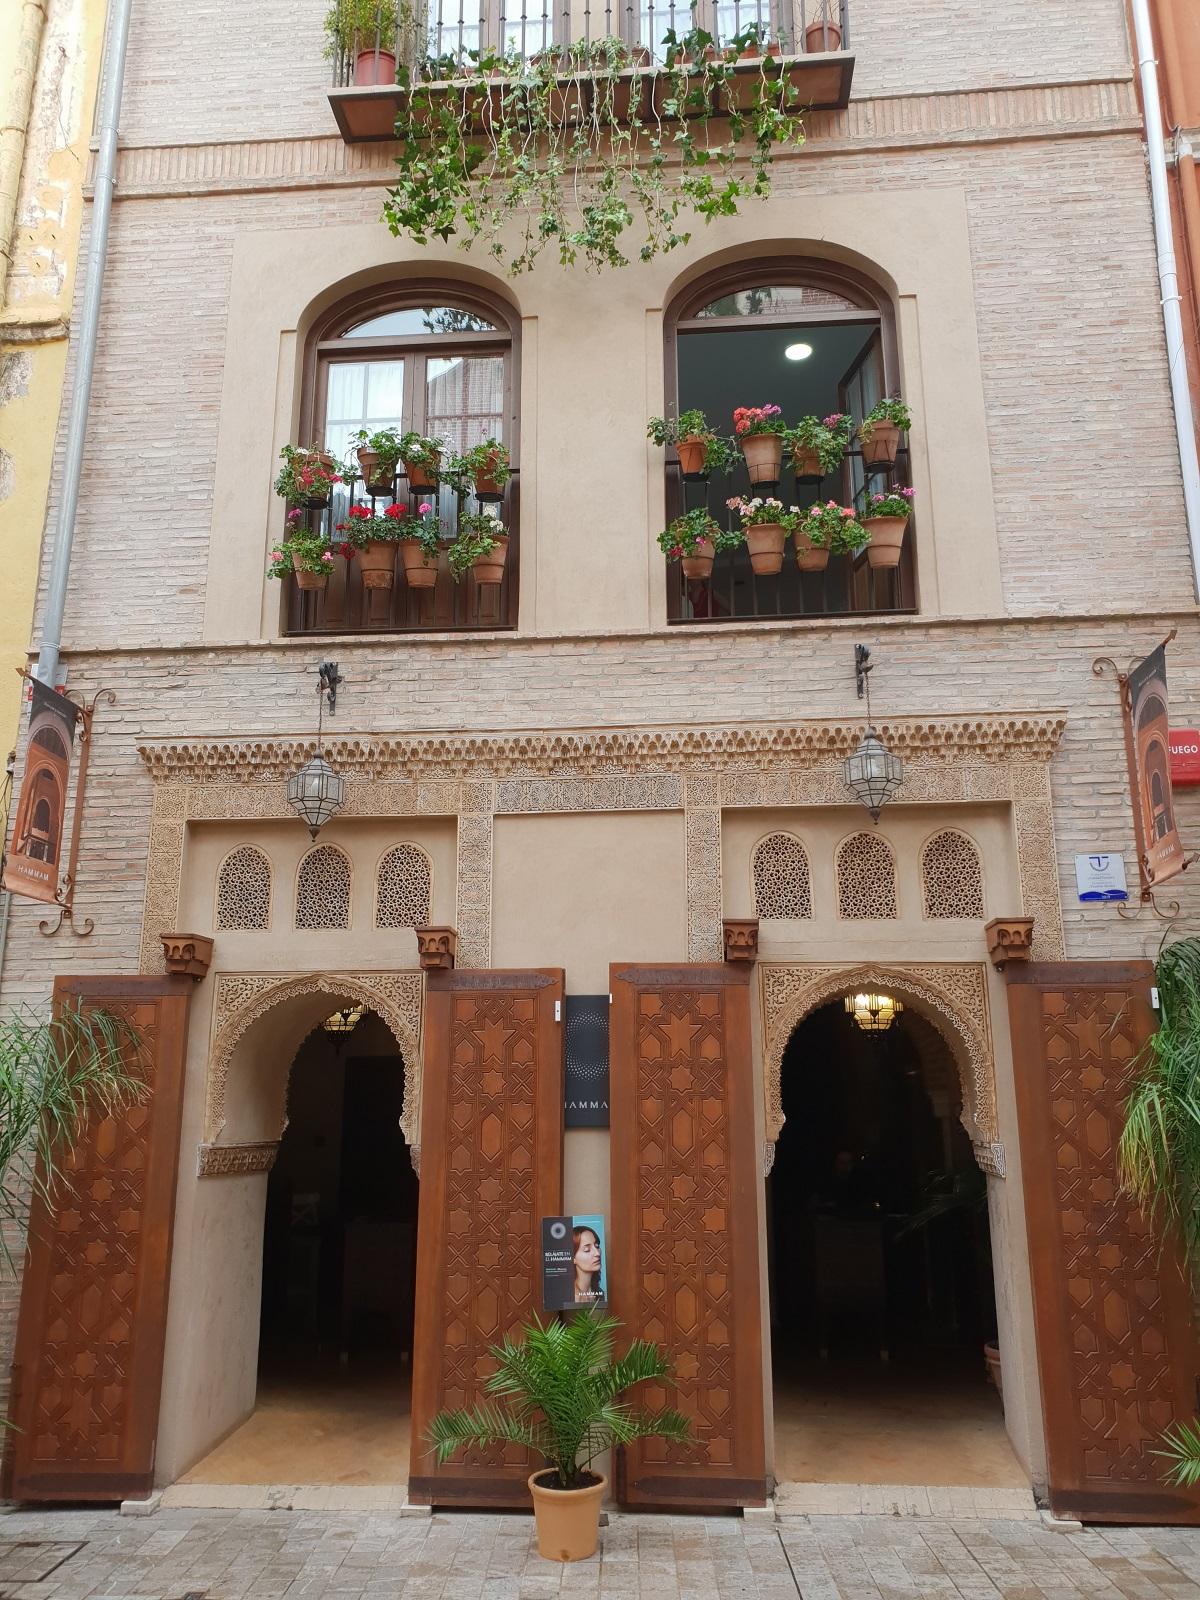 Ingang_hammam_Malaga_stedentrip